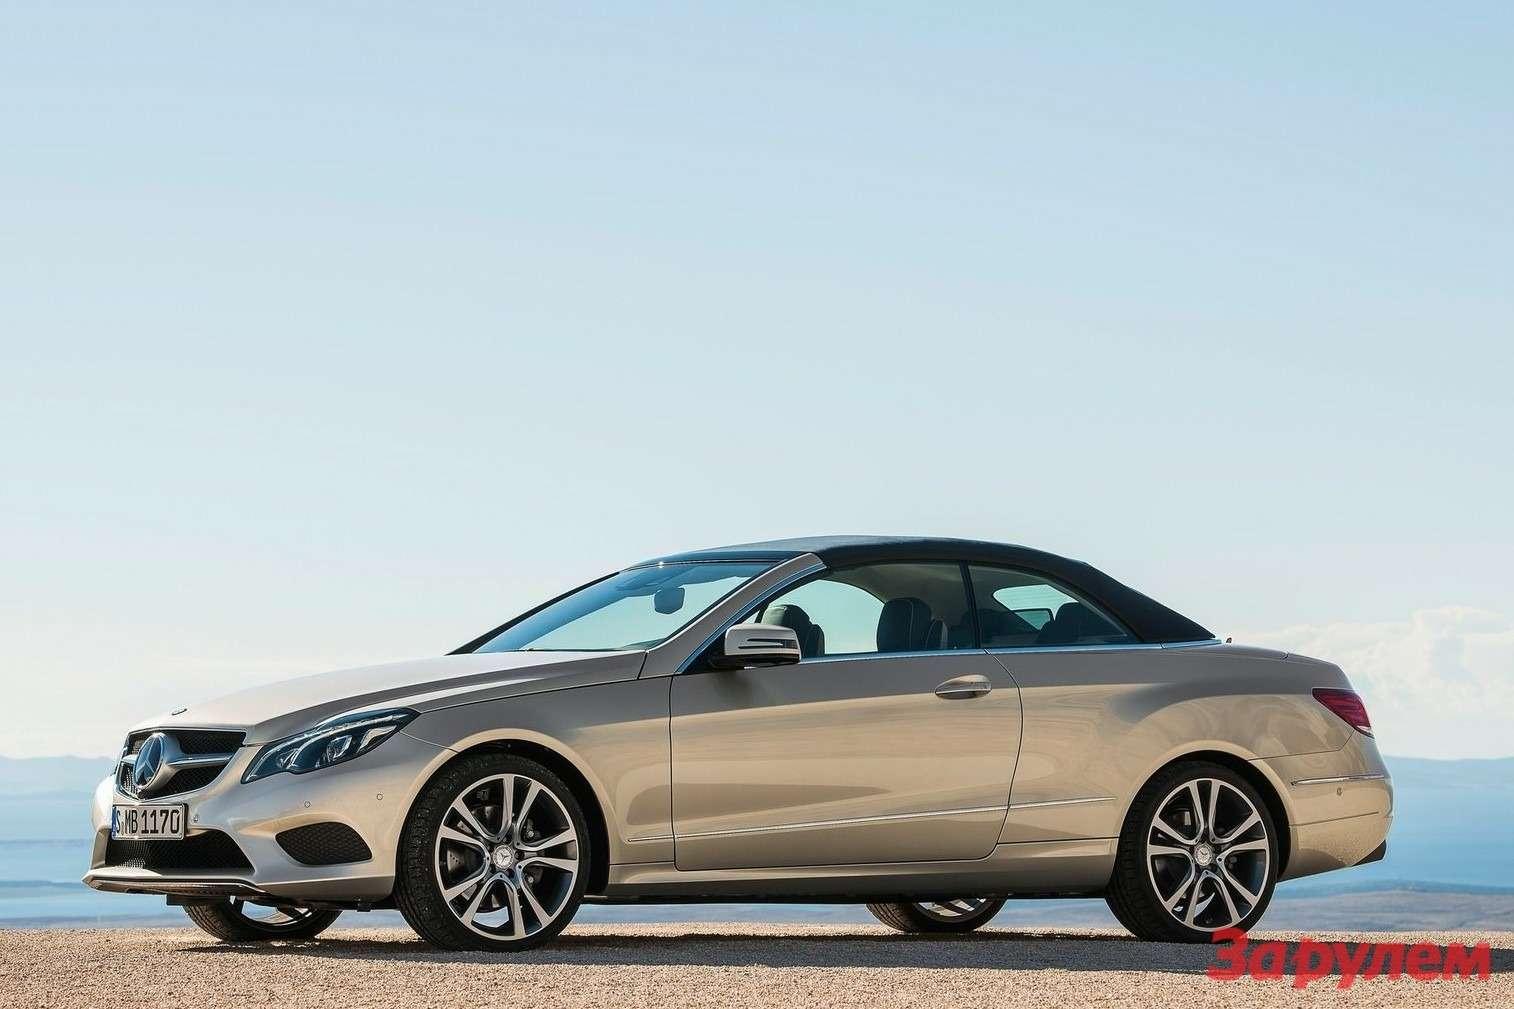 Mercedes-Benz-E-Class_Cabriolet_2014_1600x1200_wallpaper_04